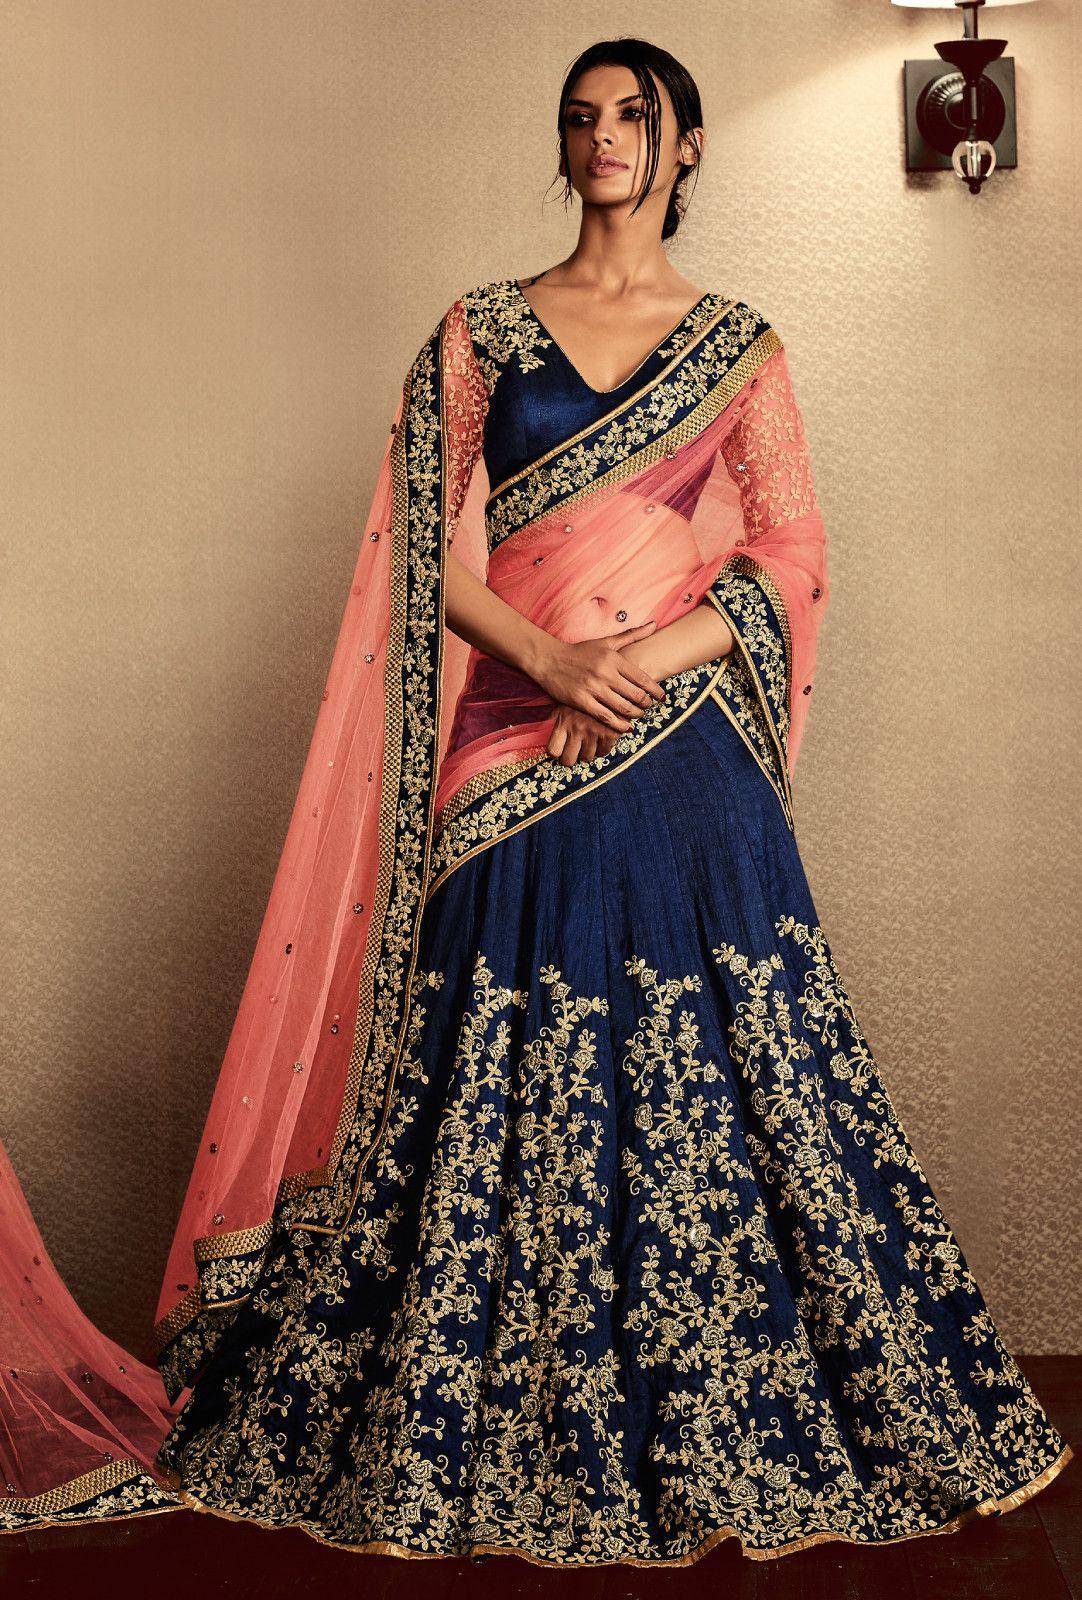 Astounding Navy Blue Cotton Designer Lehenga Choli Bridal Wedding Wear Suit Online From India With Free Worldwide Shipping Offer